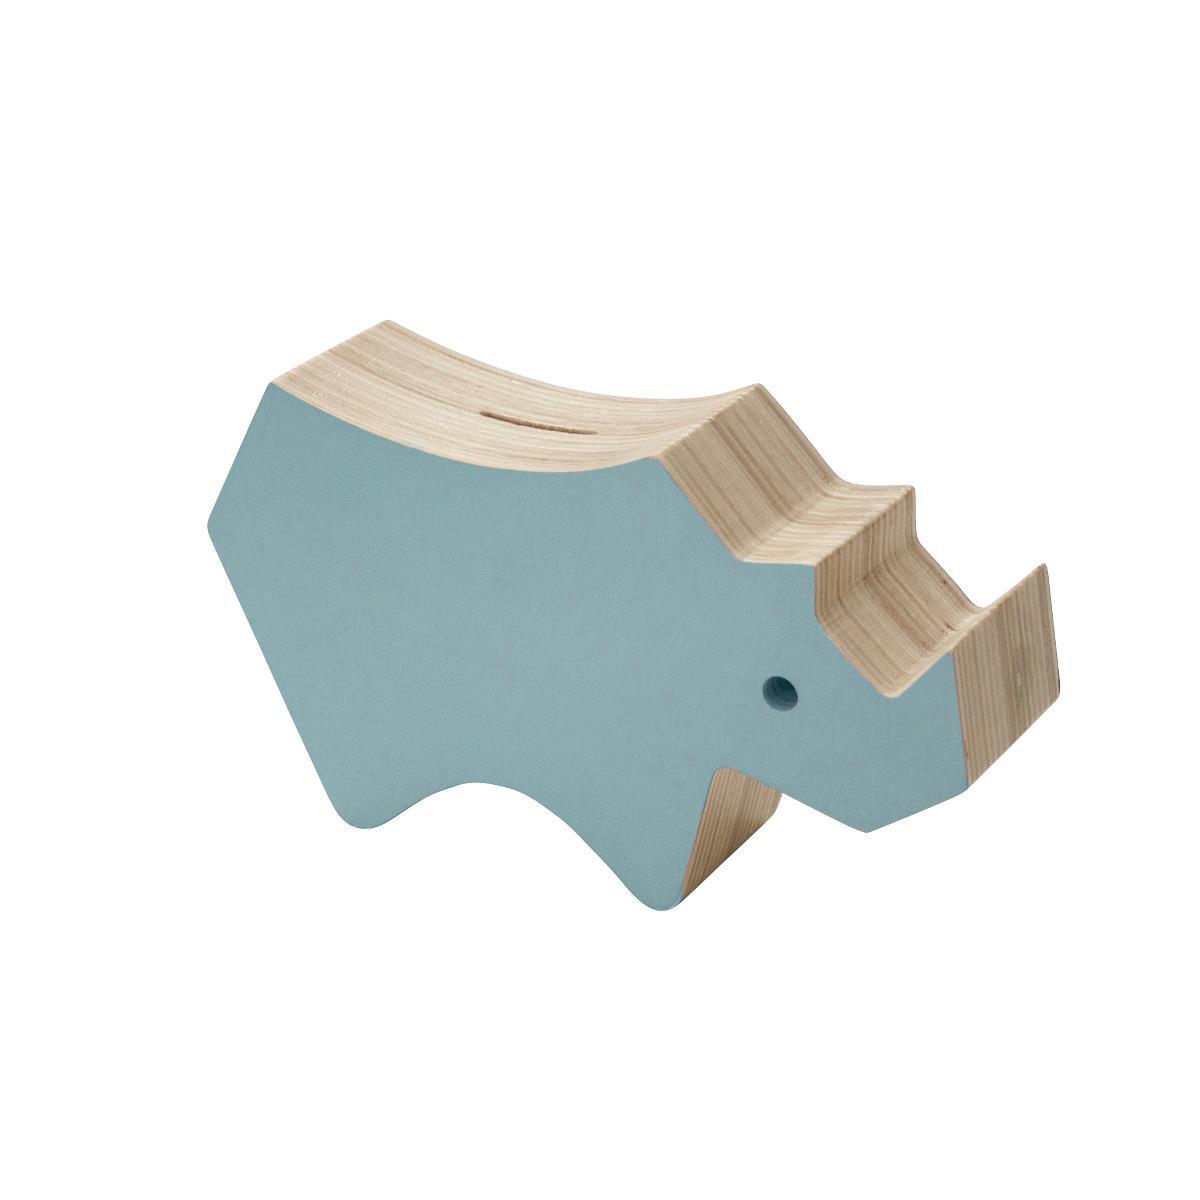 sebra Spardose aus Holz, Nashorn, wolkenblau 3017102